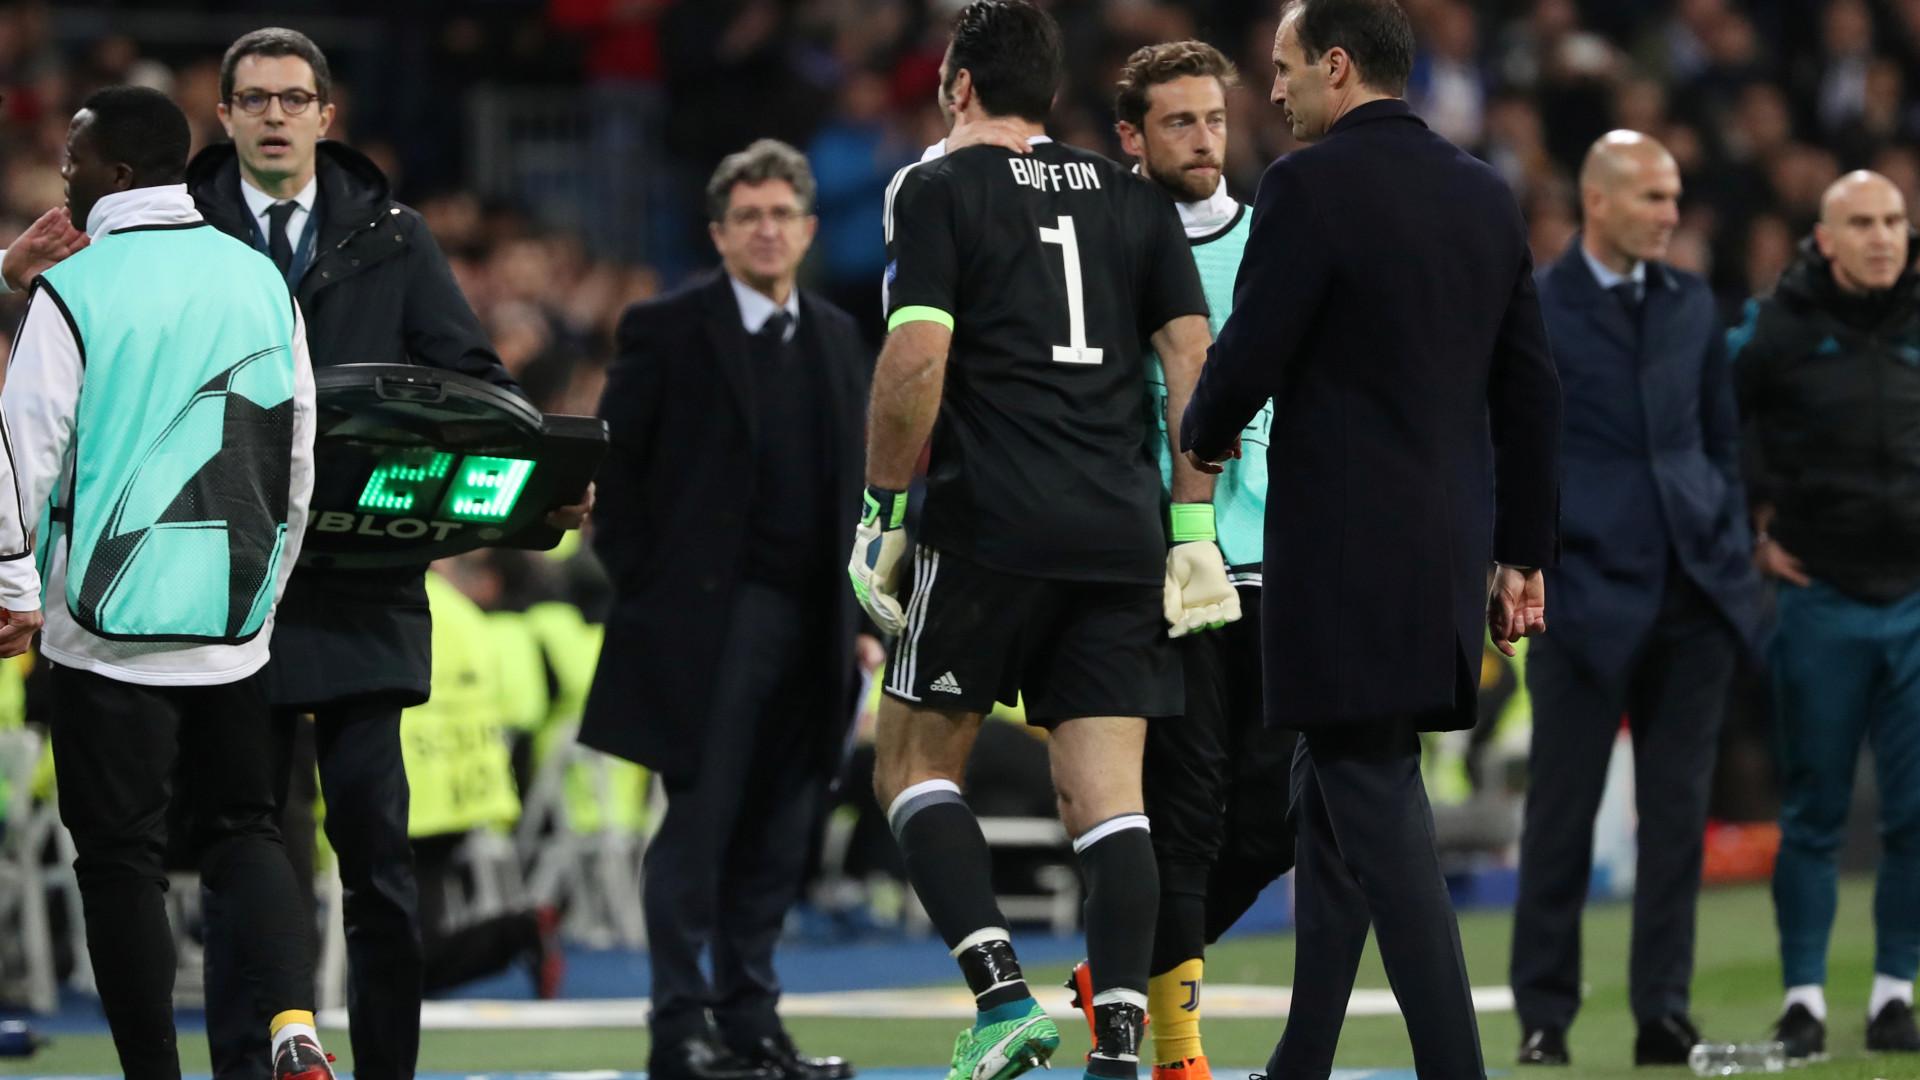 Allegri diz que a noite de Madrid fez bem a Buffon